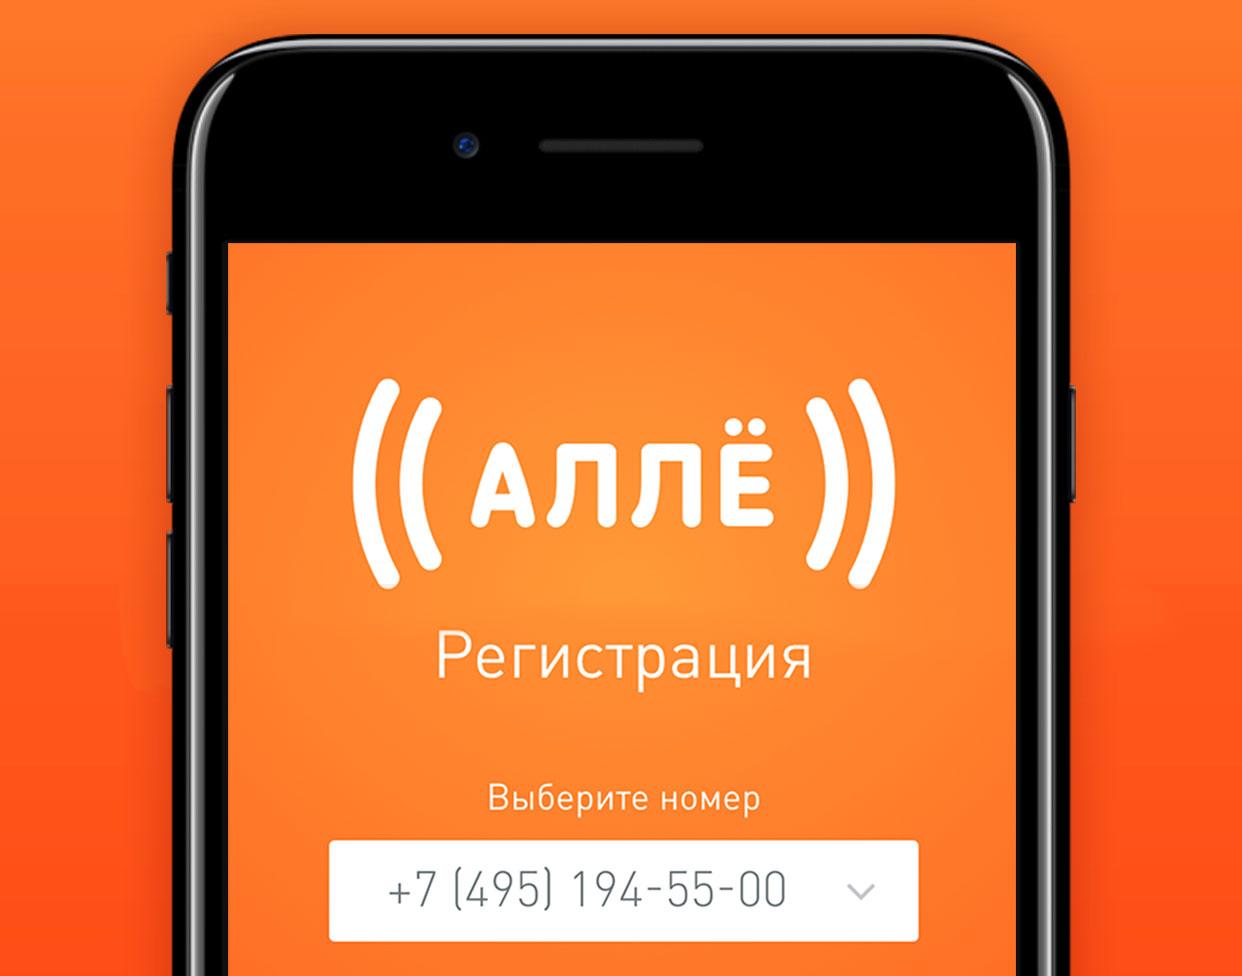 «Алле» уже неале. Альтернативный Skype иWhatsApp русский мессенджер оказался нежизнеспособен